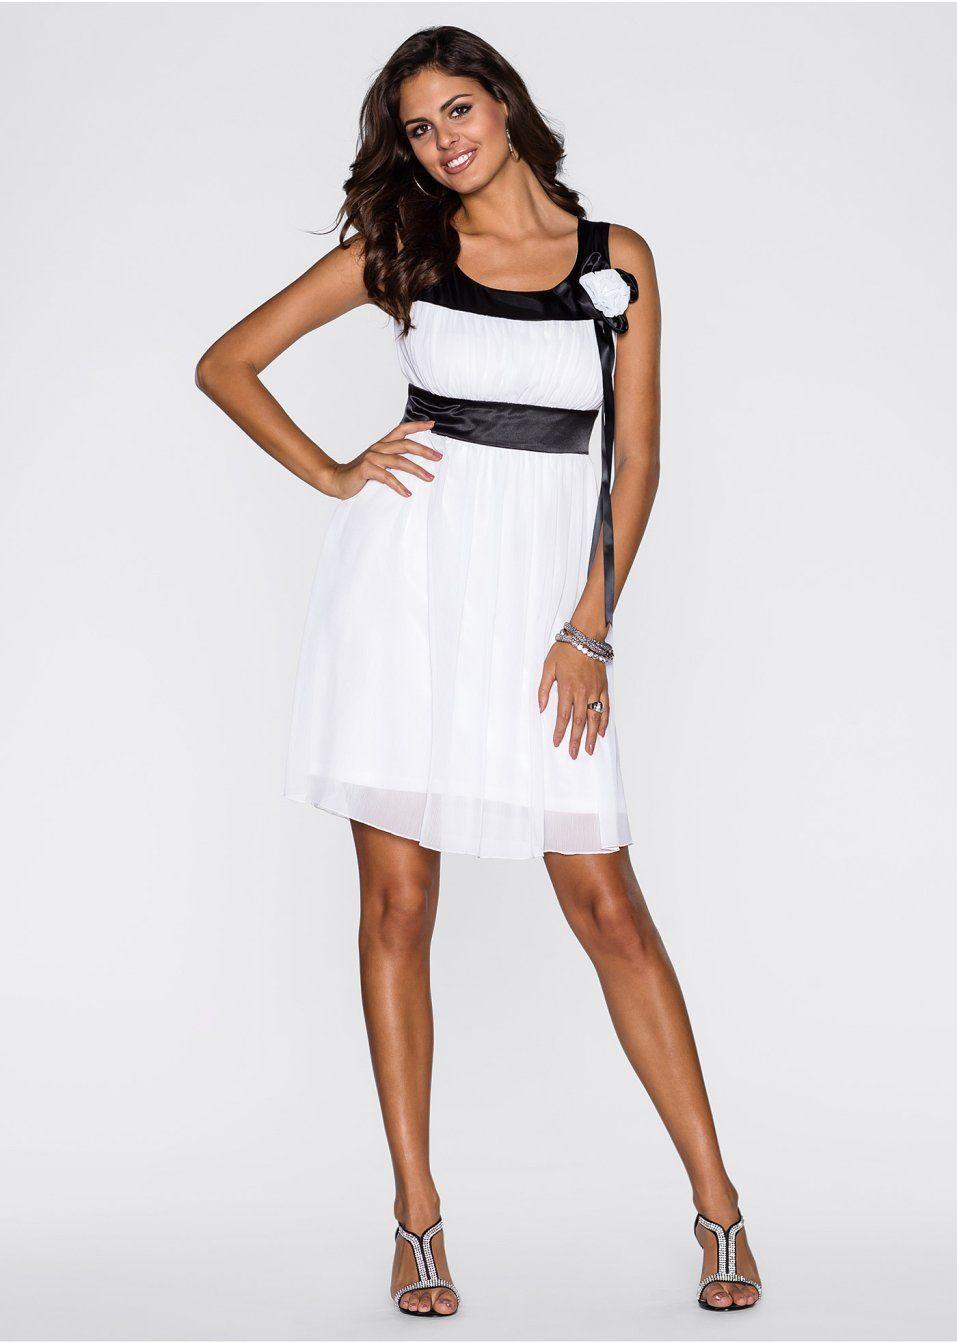 dd646b0a03 Sifon ruha Csinos sifon blúz • 8799.0 Ft • bonprix   Clothes for ...